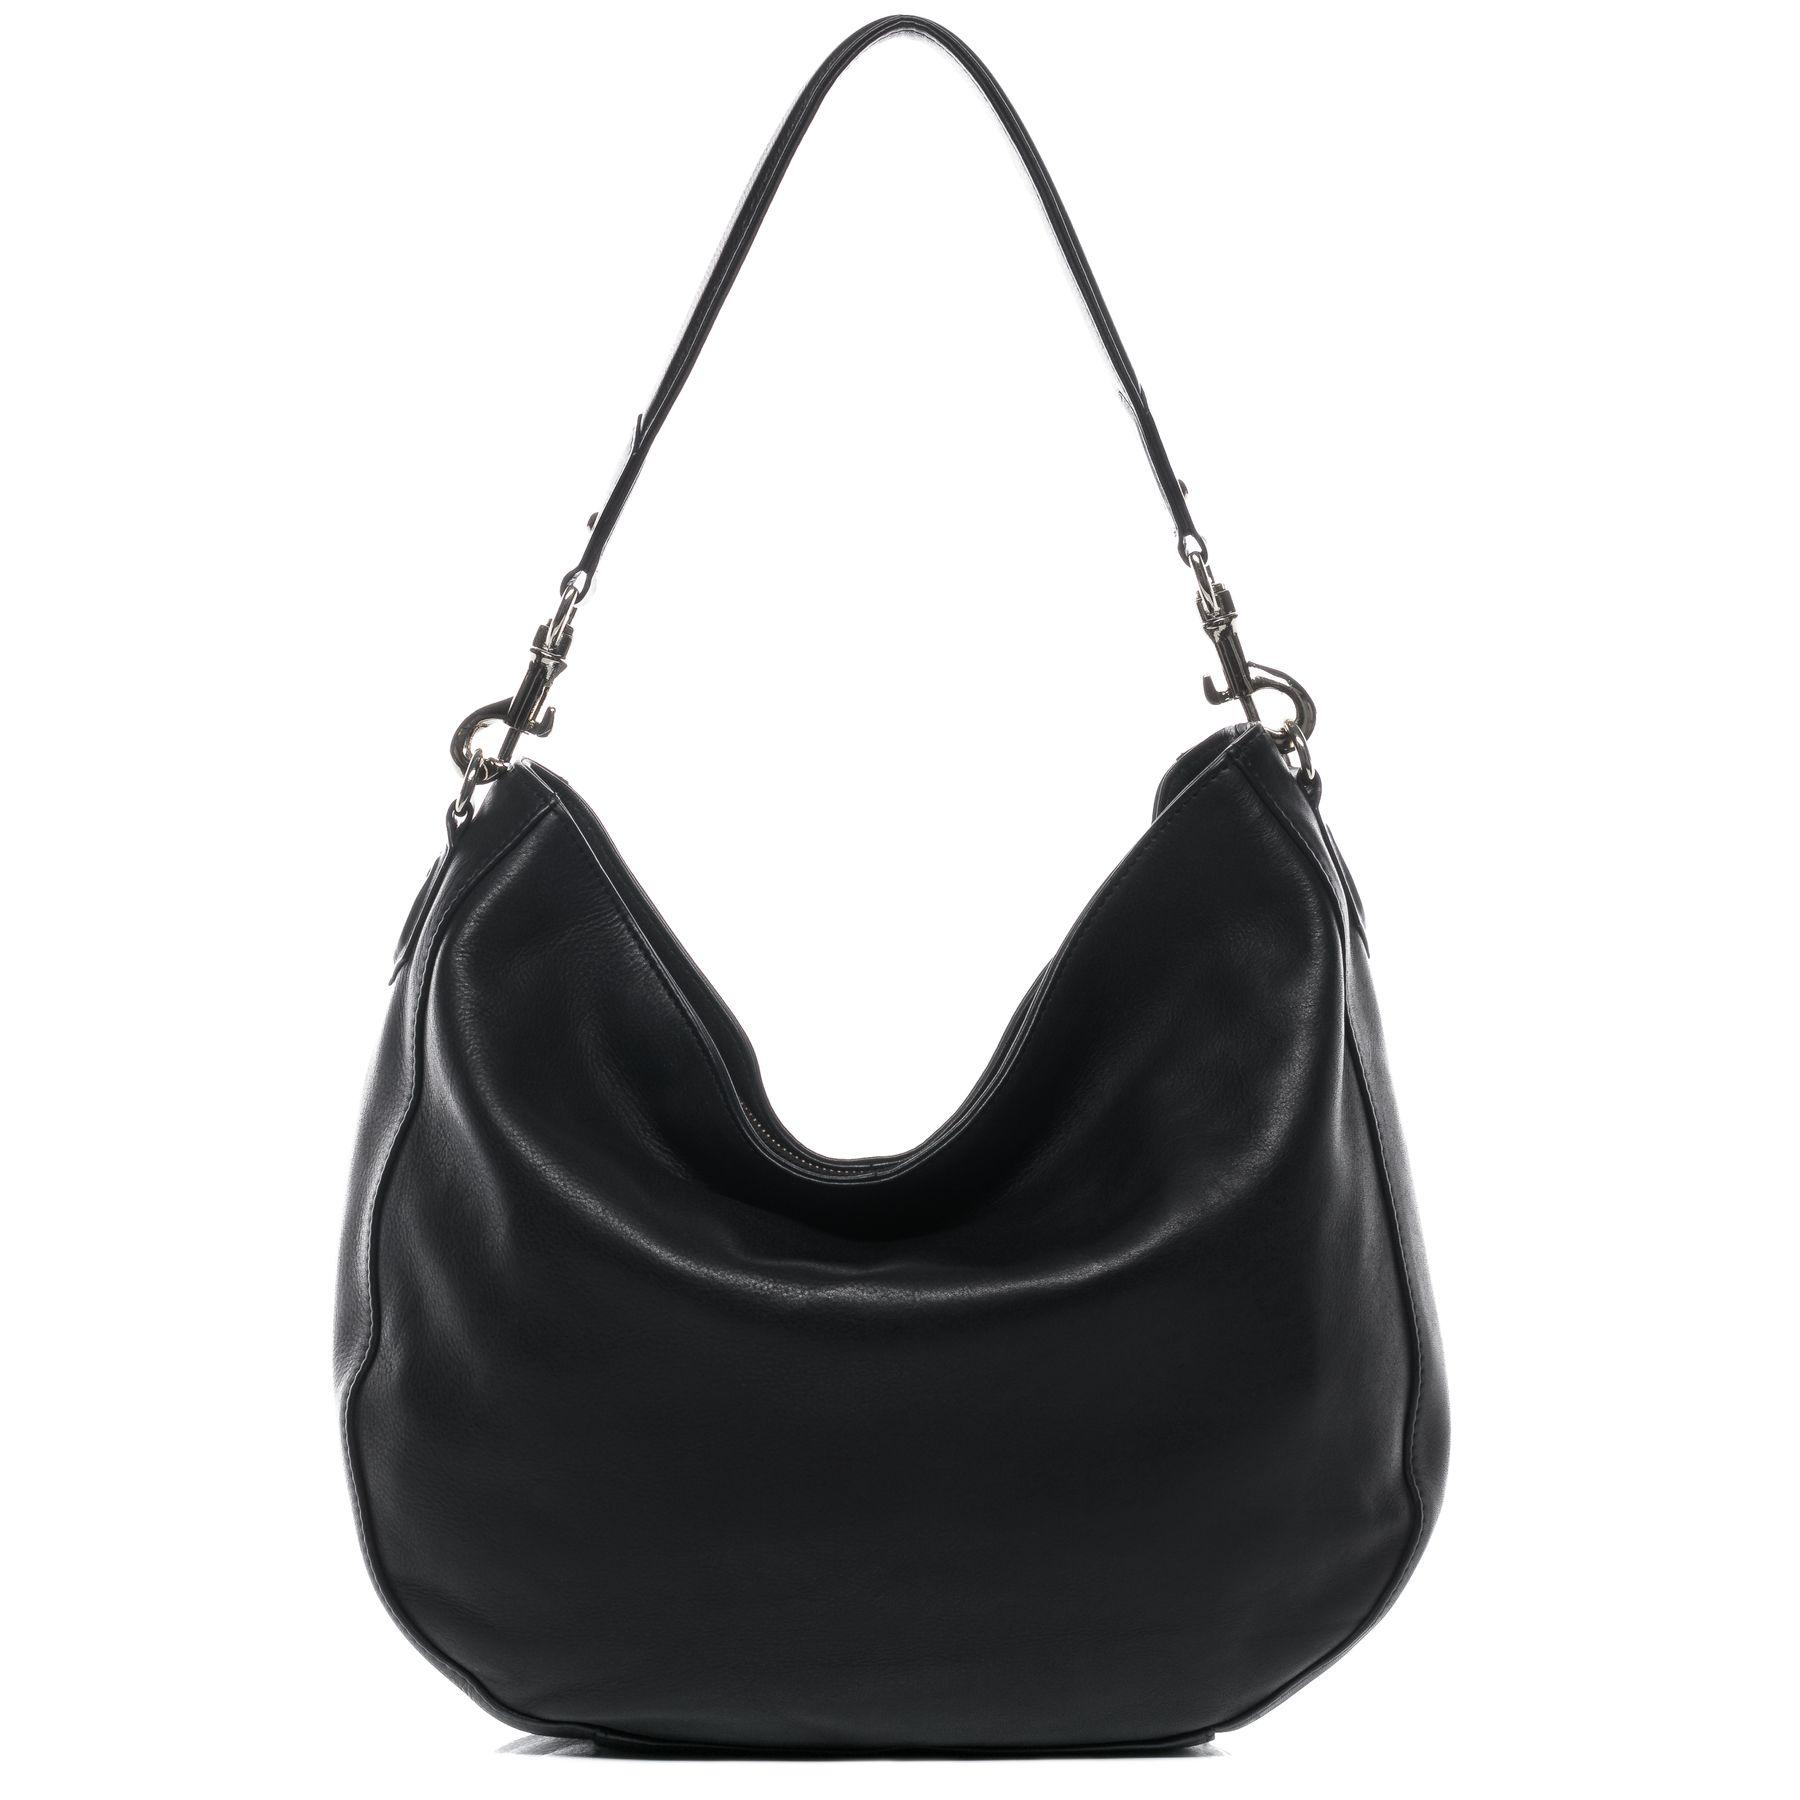 hobo sac femme épaule cuir Sacs sacoche main noir porté à Sacs sac fourre tout BACCINI 1twBfTqn1